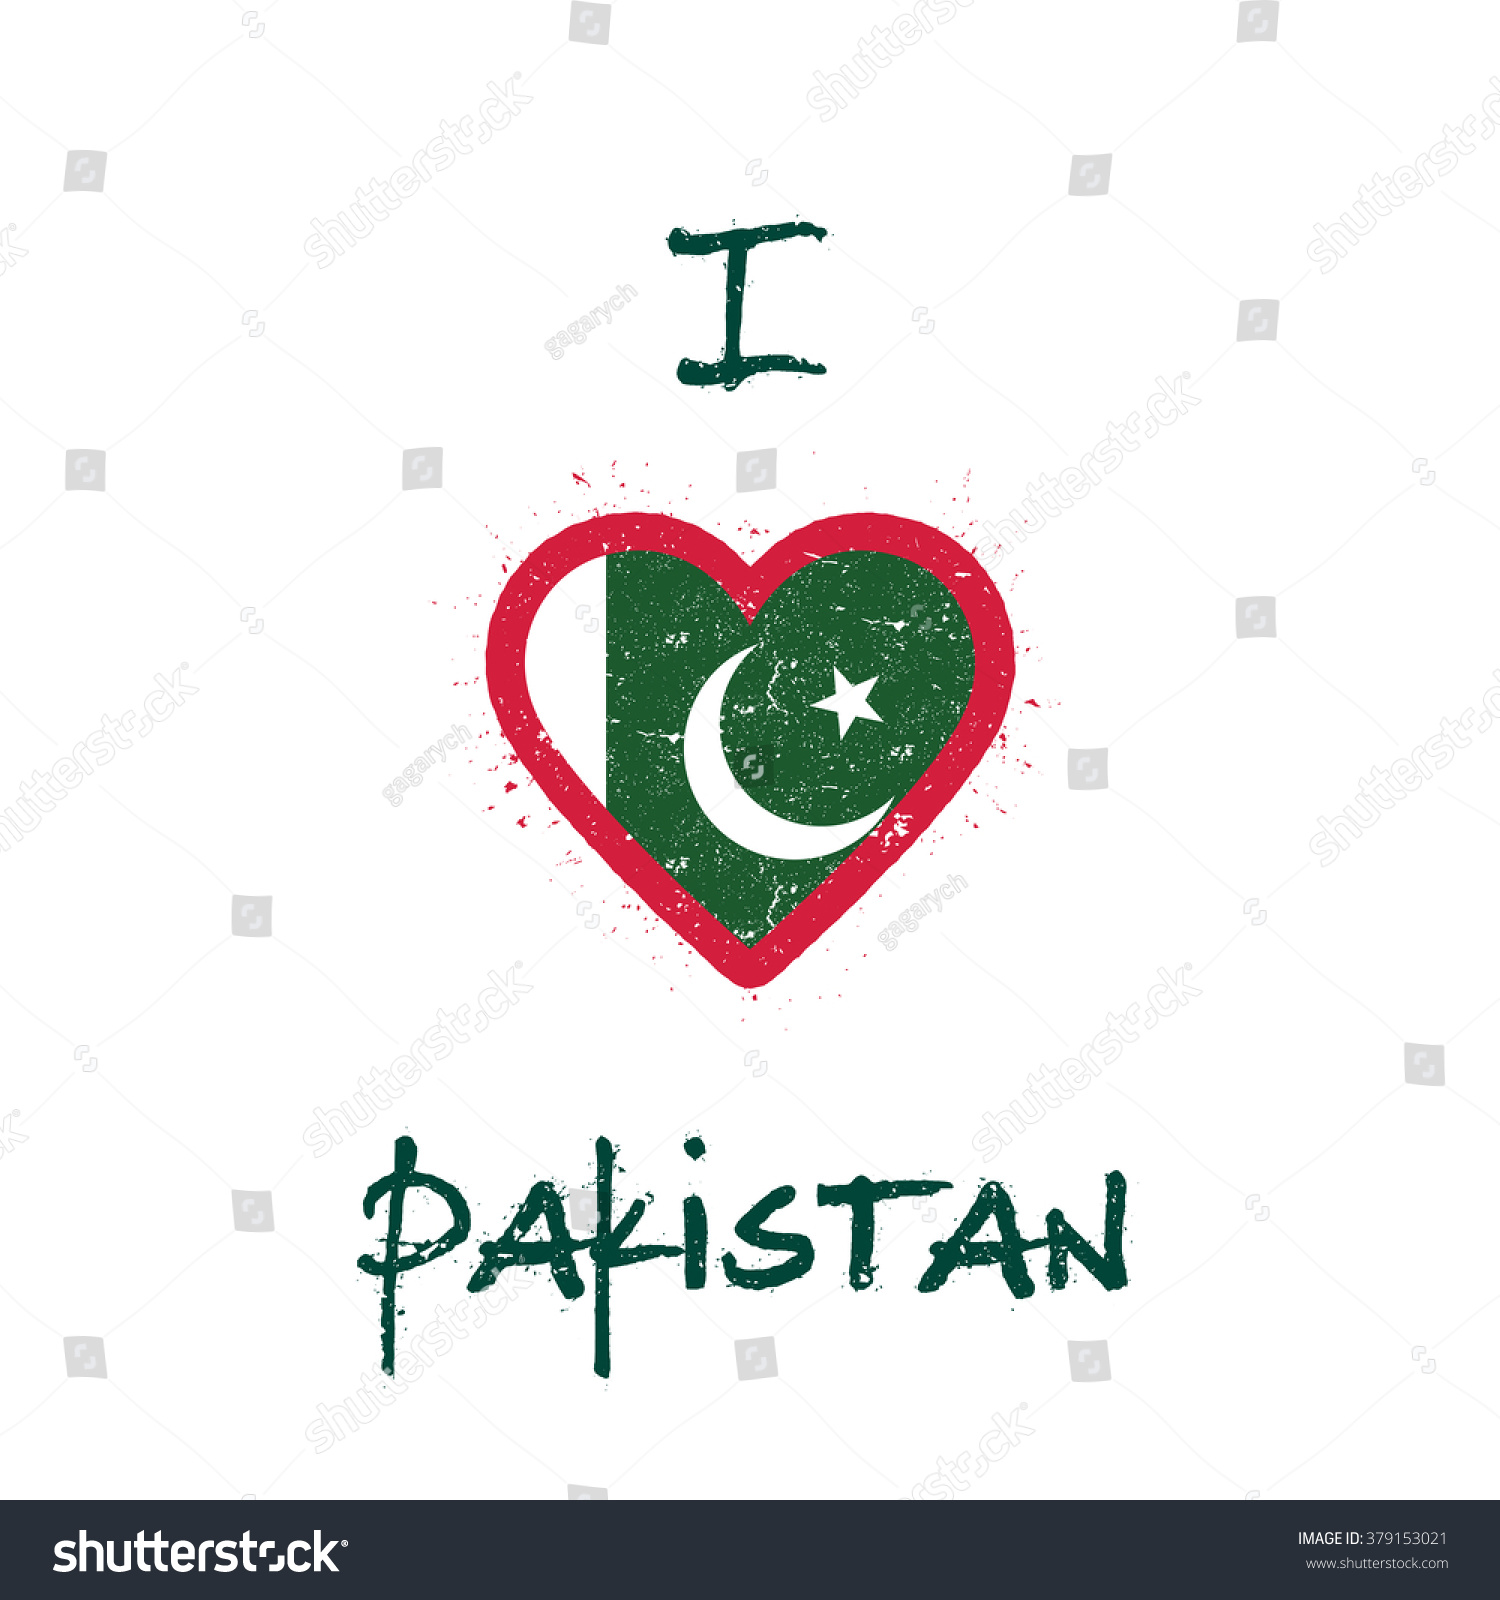 Shirt design ideas pakistani - I Love Pakistan T Shirt Design Pakistan Flag In The Shape Of Heart On